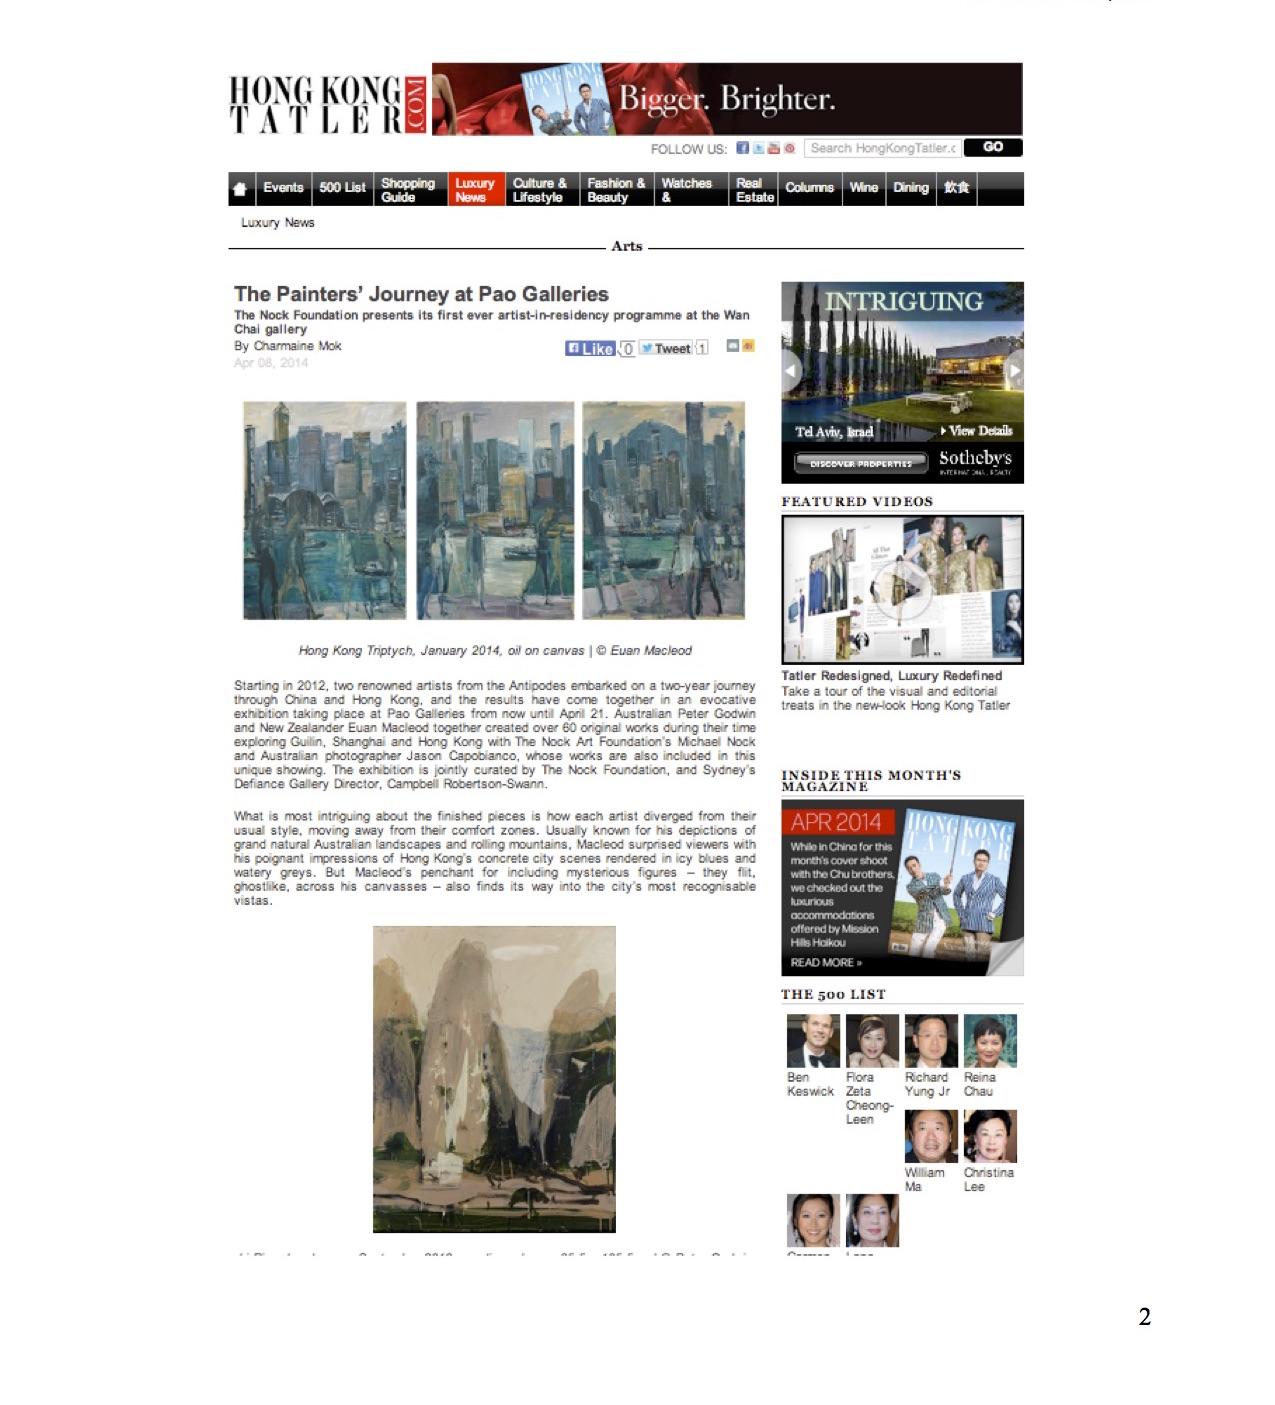 Art Lease, 8 April 2014, HK Tatler Online, Coverage Report.jpg